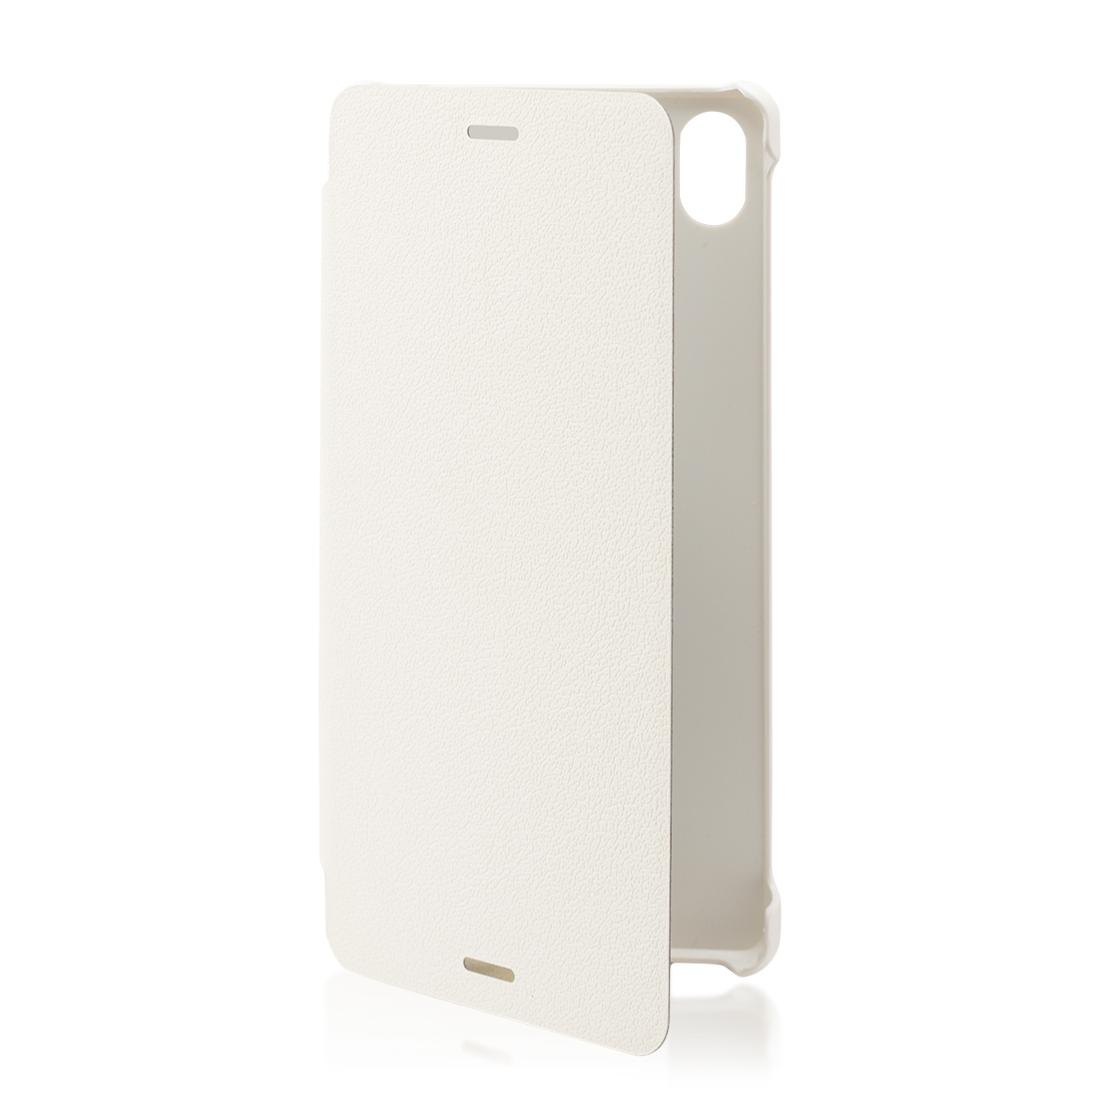 Чехол Brosco Cover для Sony Xperia Z3 White